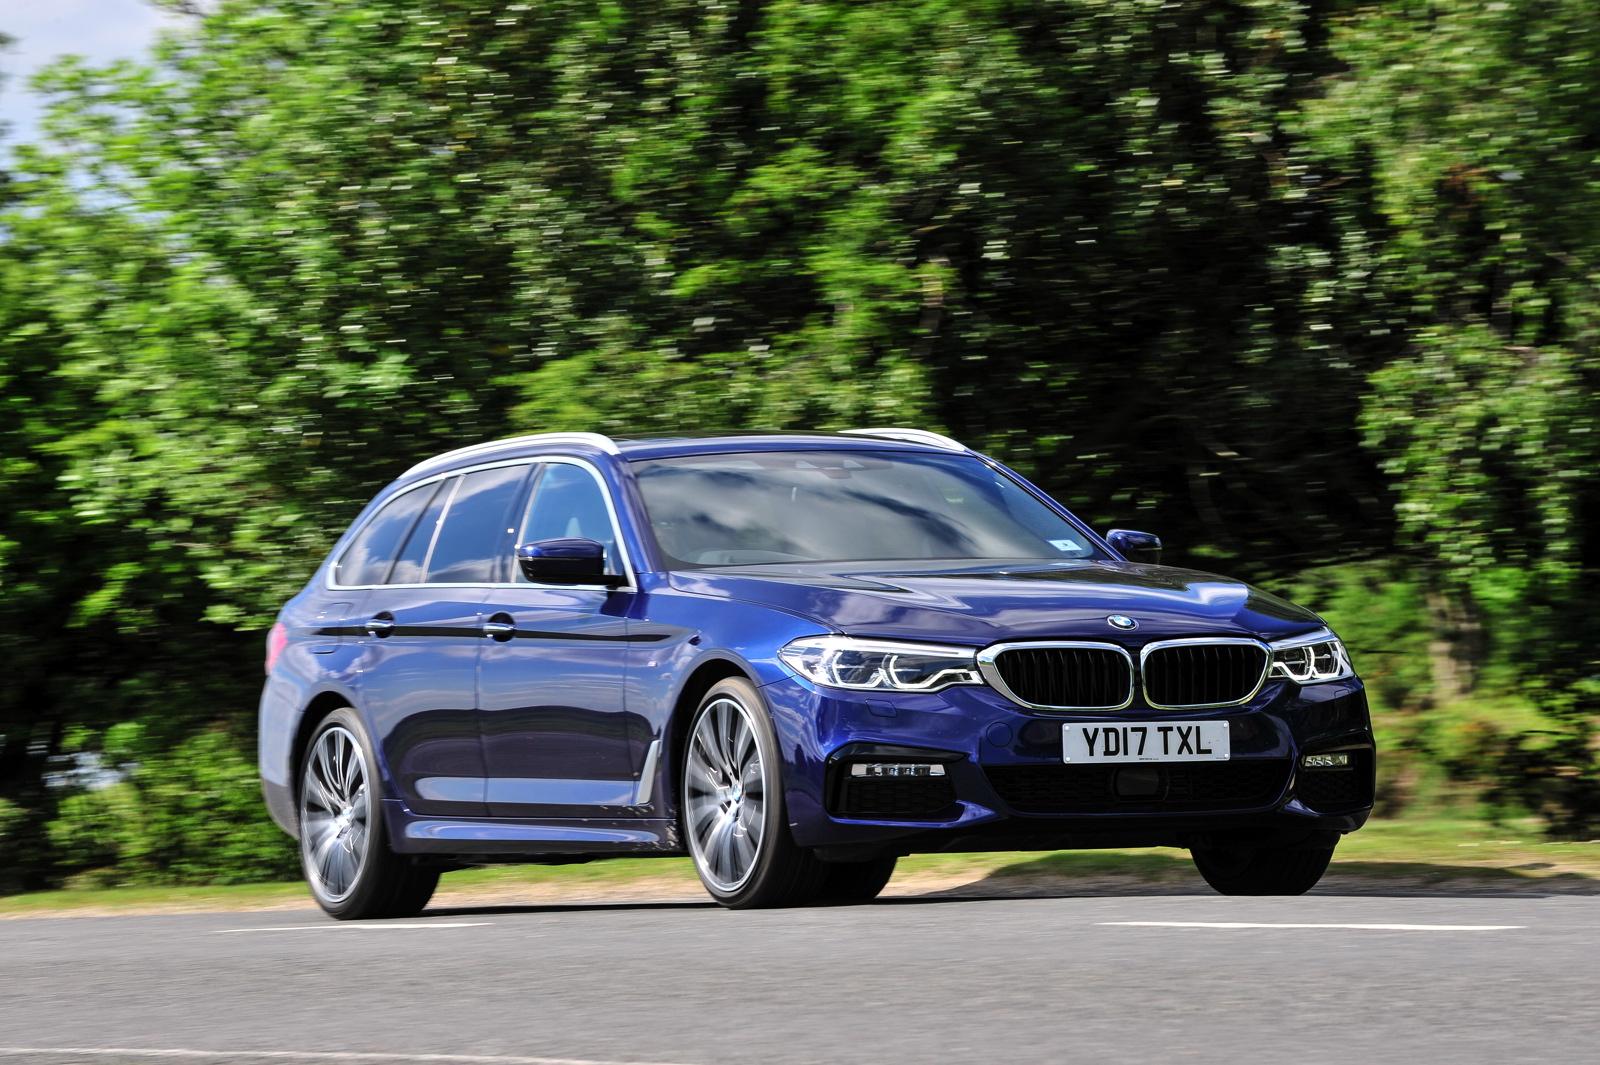 2017 BMW 5 Series Touring England 96